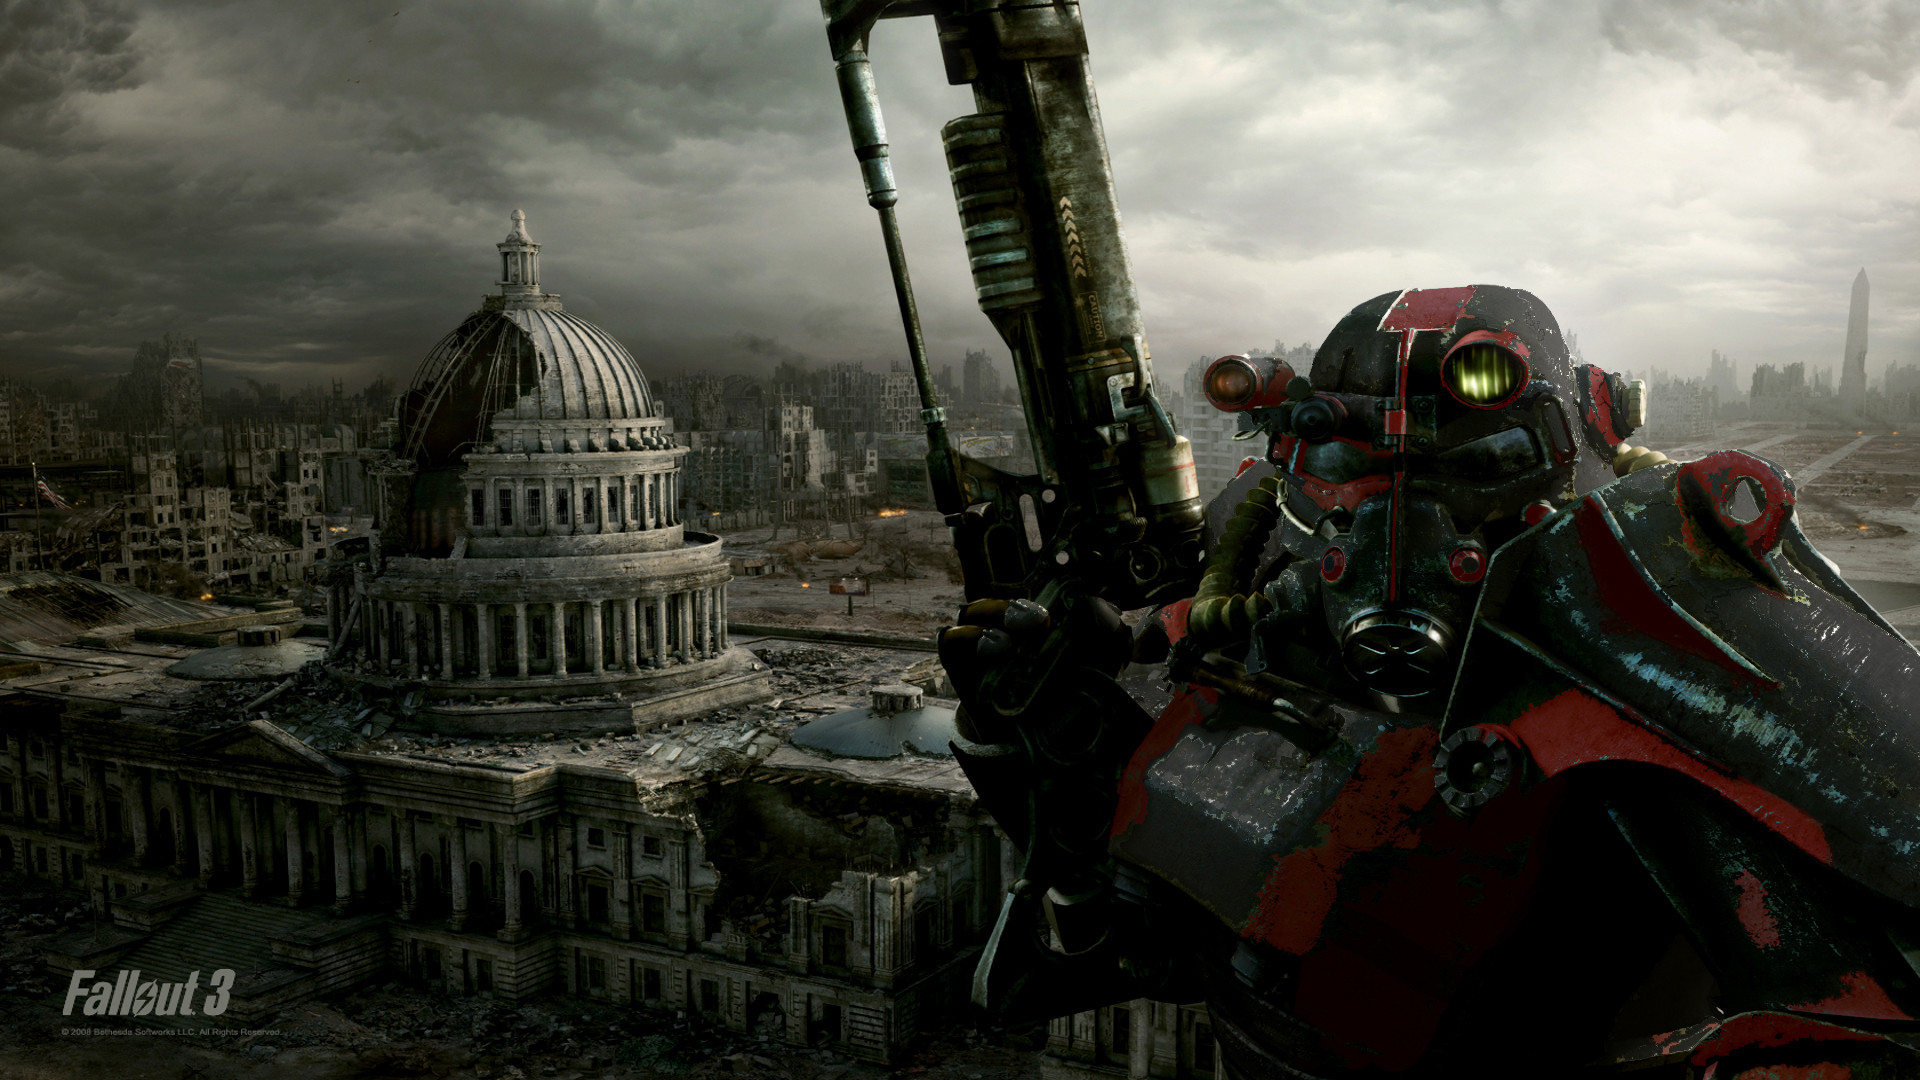 Video games brotherhood outcast Fallout 3 wallpaper | | 224434 |  WallpaperUP